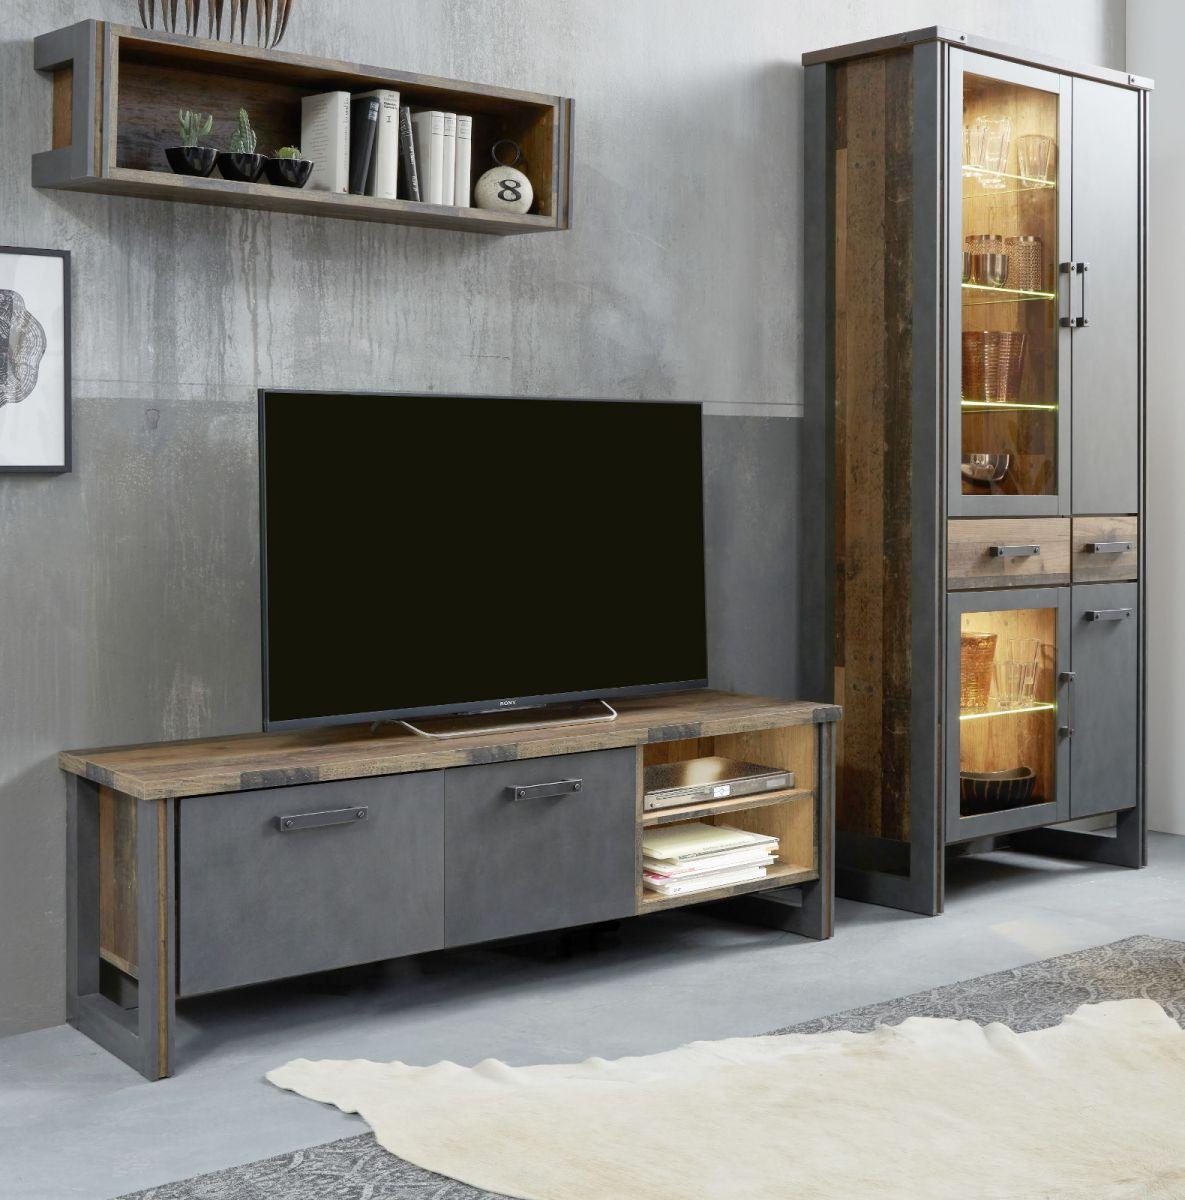 Wohnwand Prime in Old Used Wood und Matera grau 282 cm